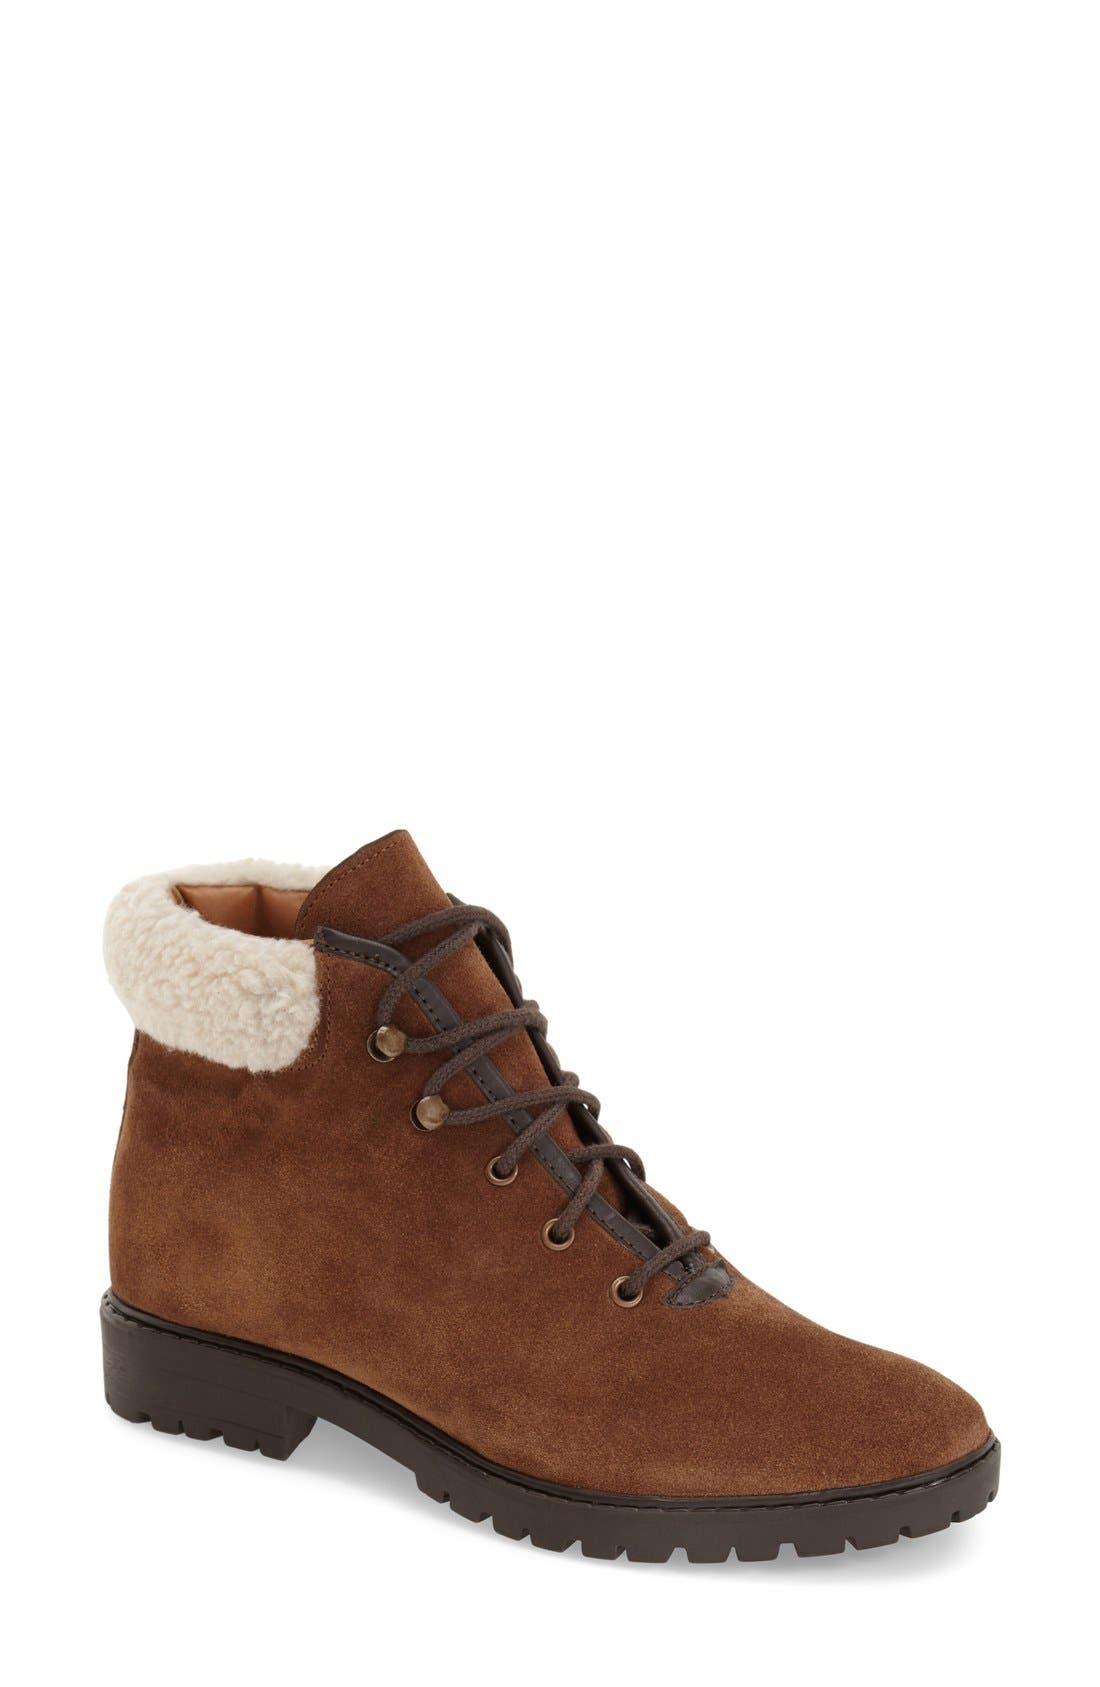 Main Image - Topshop Lace-Up Ankle Boots with Faux Fur Trim (Women)